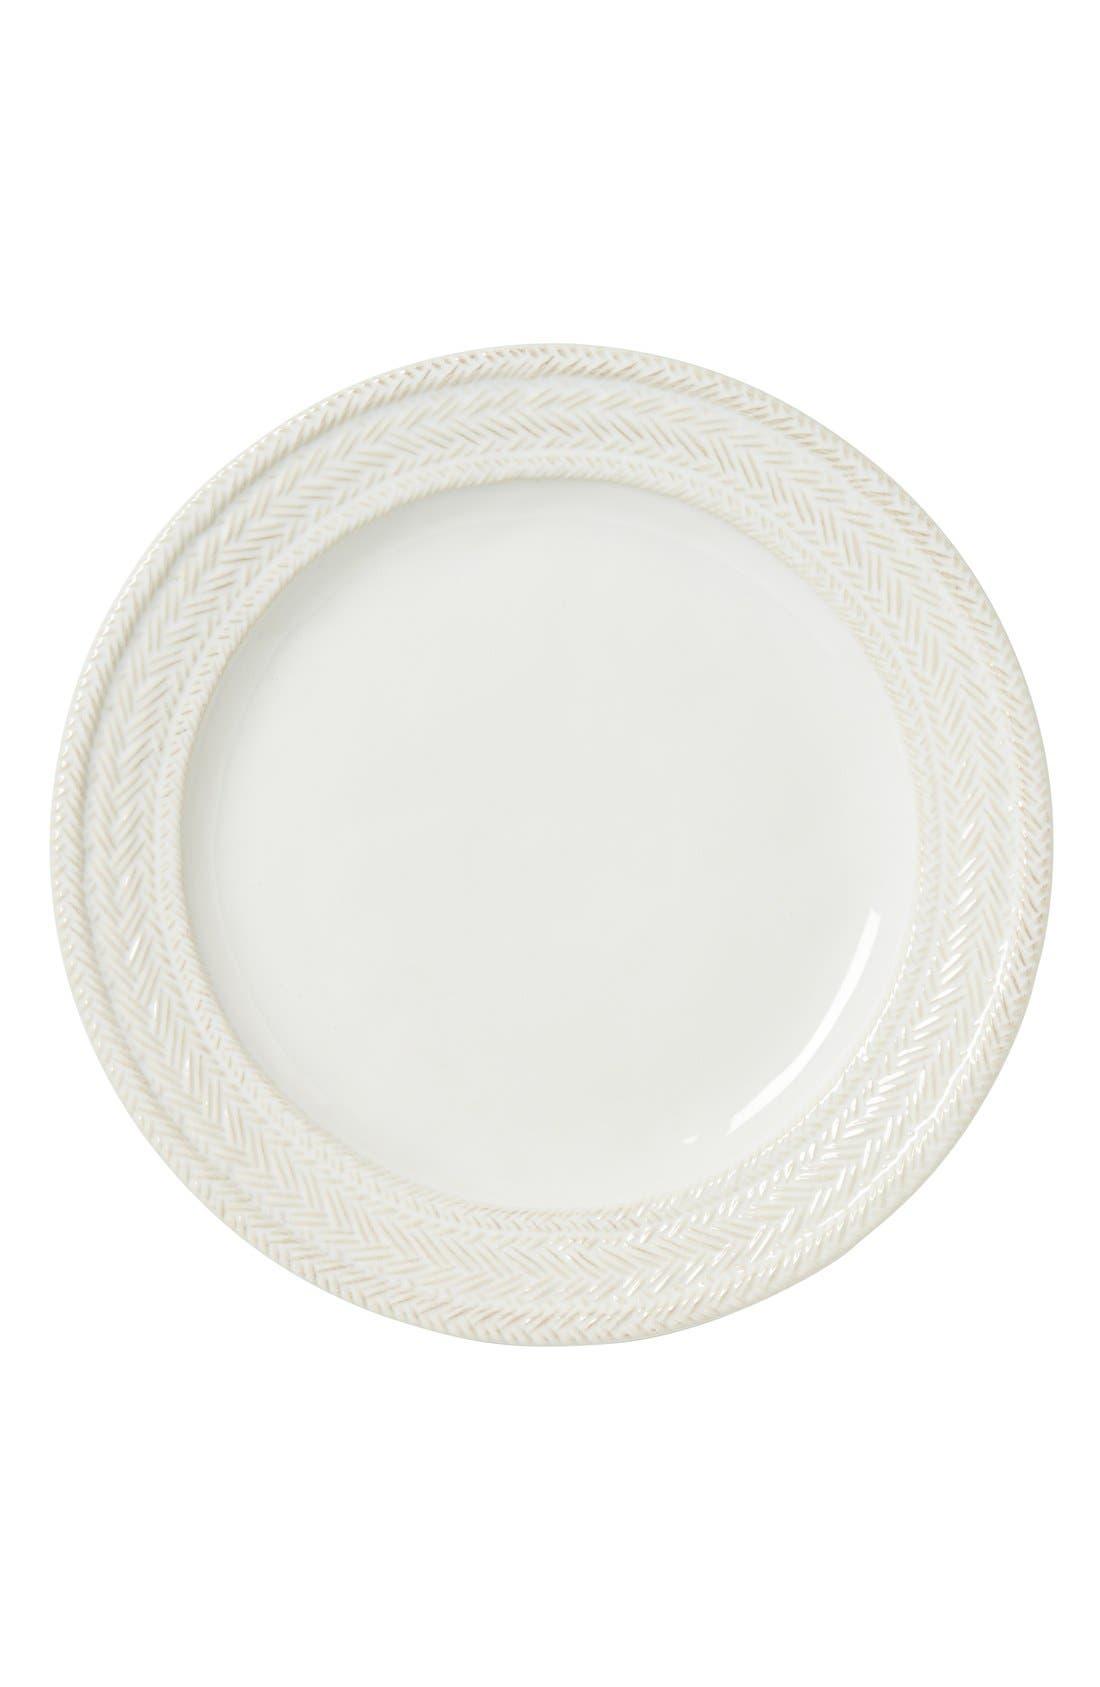 Le Panier Dinner Plate,                             Main thumbnail 1, color,                             WHITEWASH